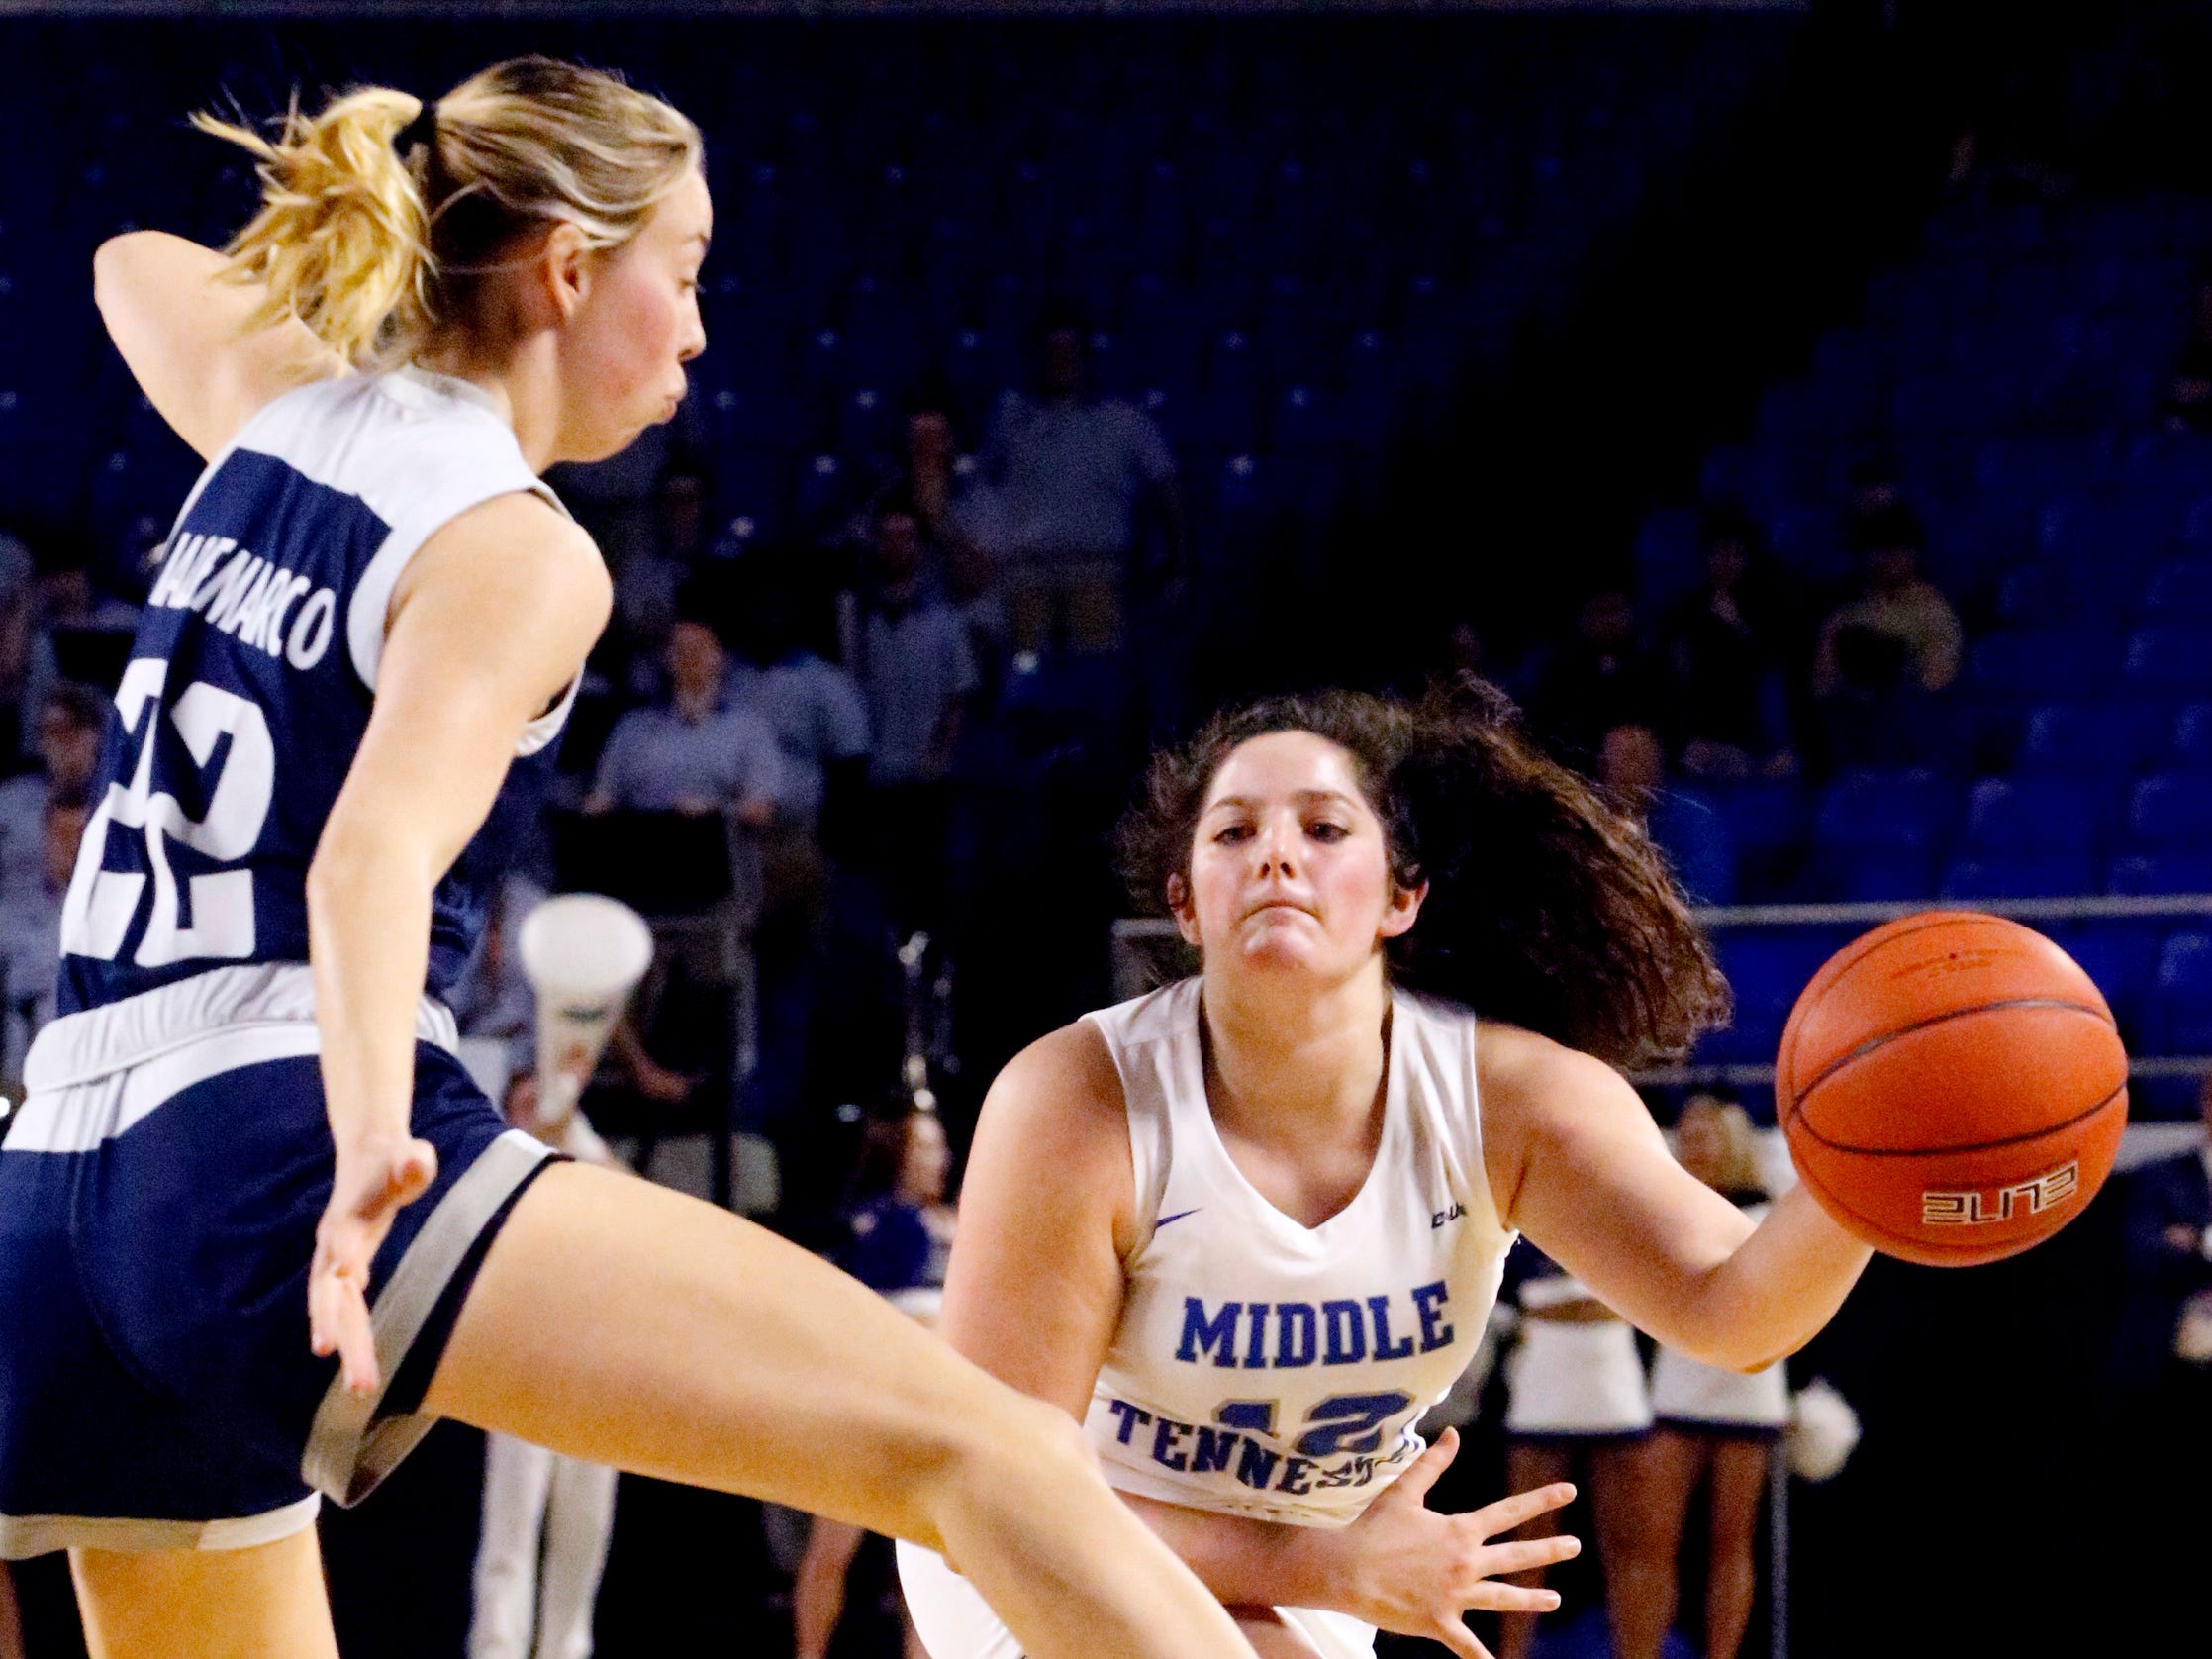 MTSU's guard Jess Louro (12) passes the ball around Rice's center Nancy Mulkey (32) on Thursday Jan. 24, 2019.